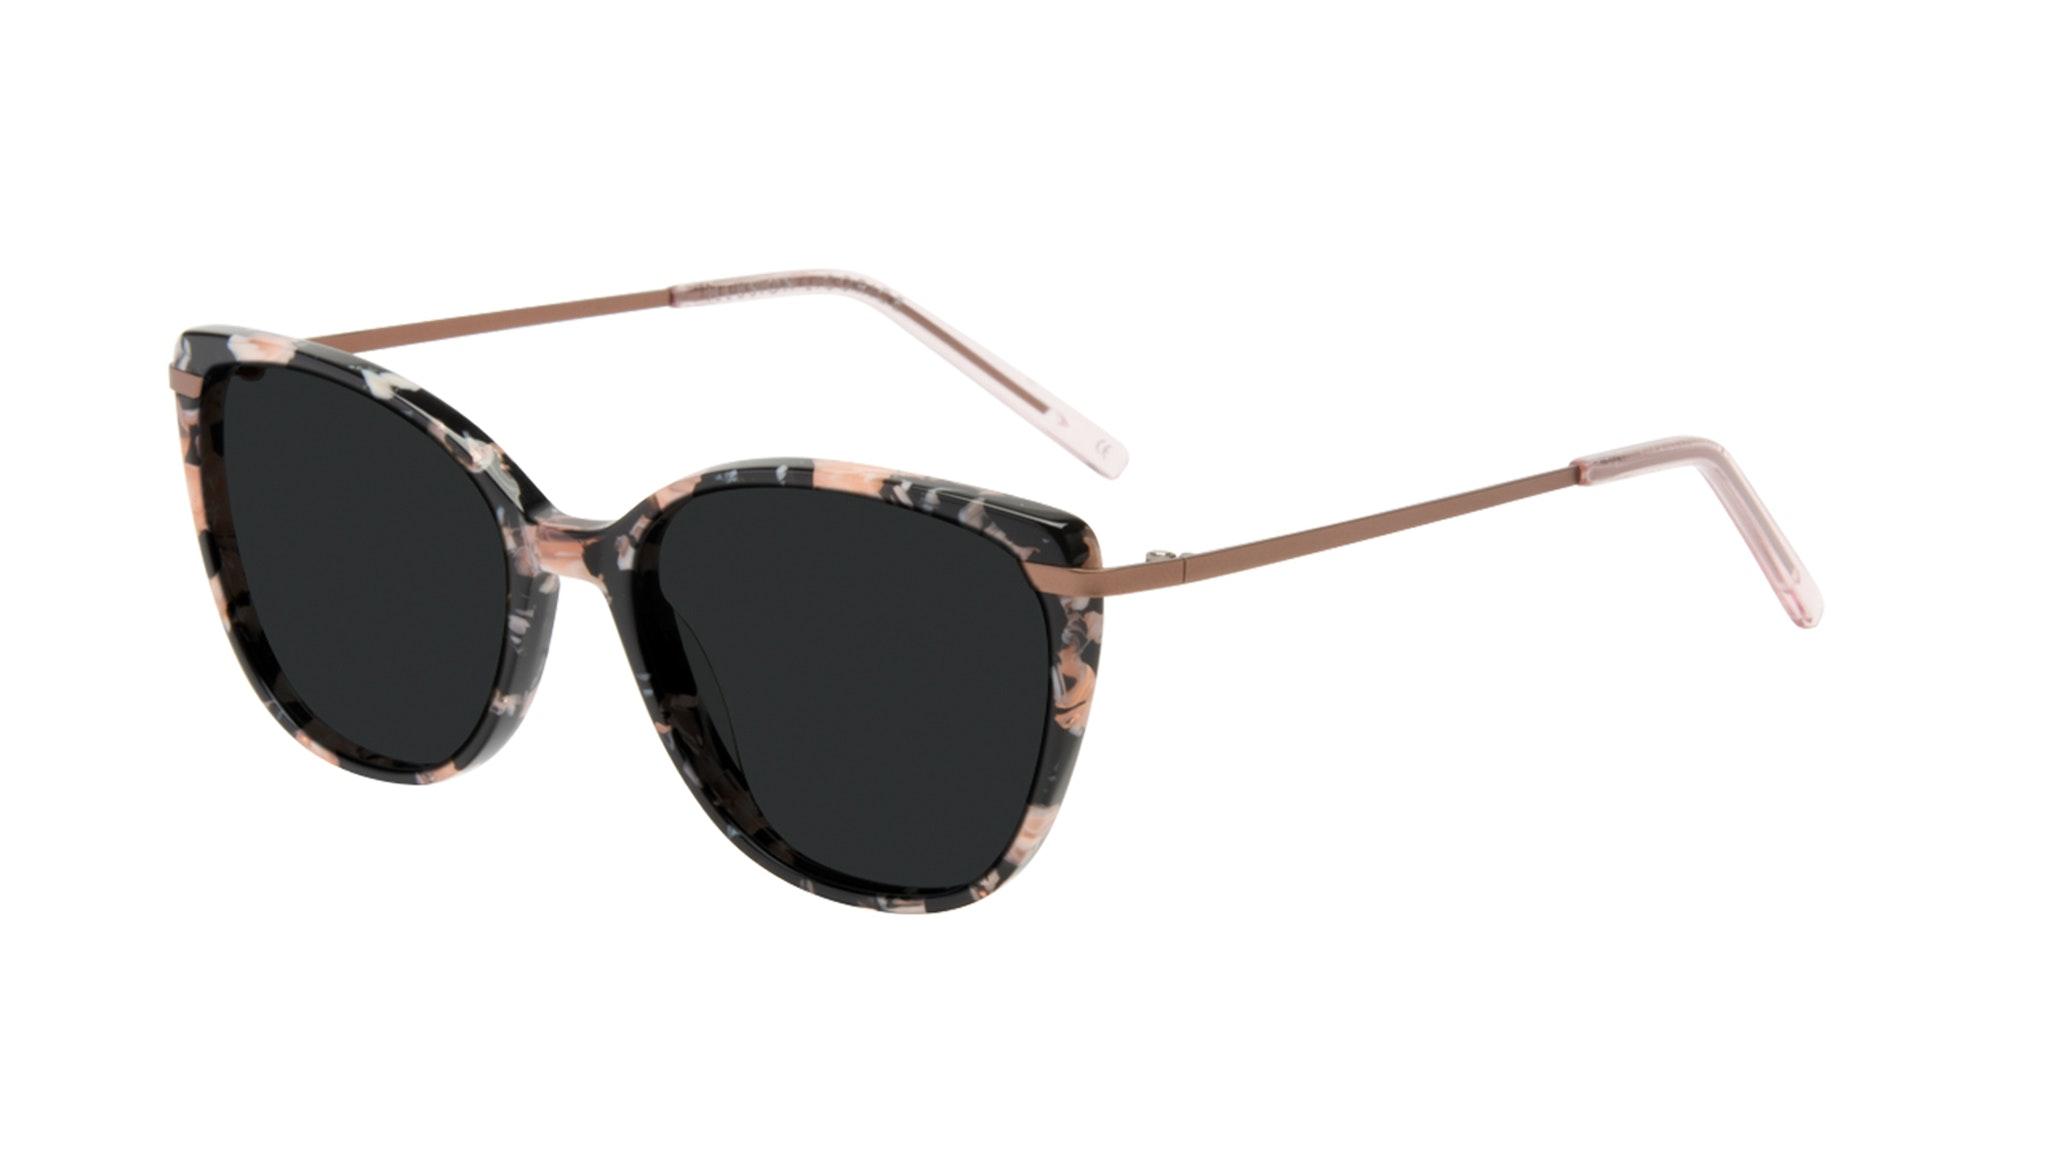 Affordable Fashion Glasses Cat Eye Rectangle Square Sunglasses Women Illusion Licorice Tilt